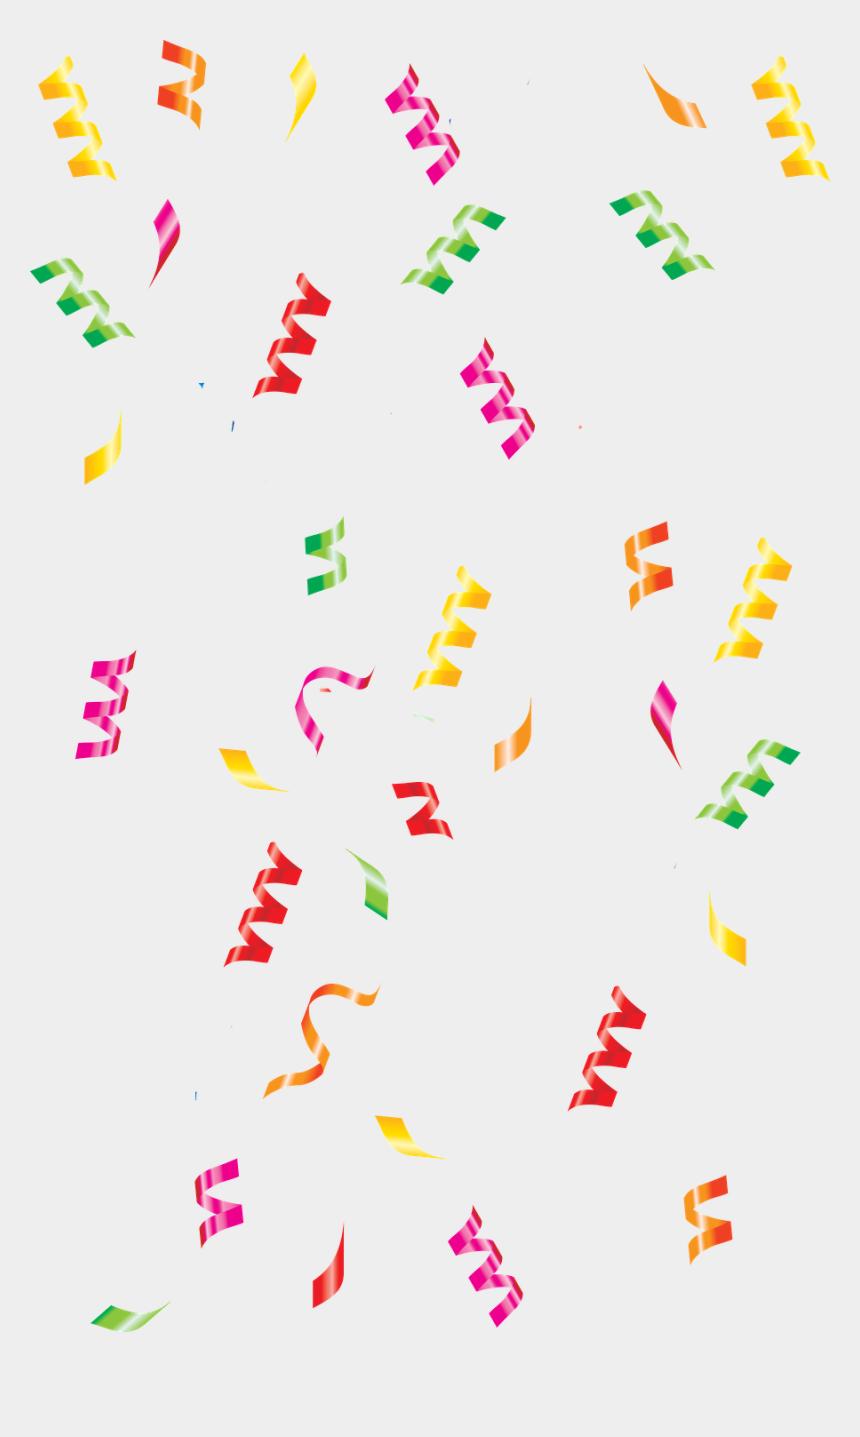 celebration clipart, Cartoons - Confetti Paper Confetti, Celebration, Clip Art, Birthday - Confetti Celebration Clip Art